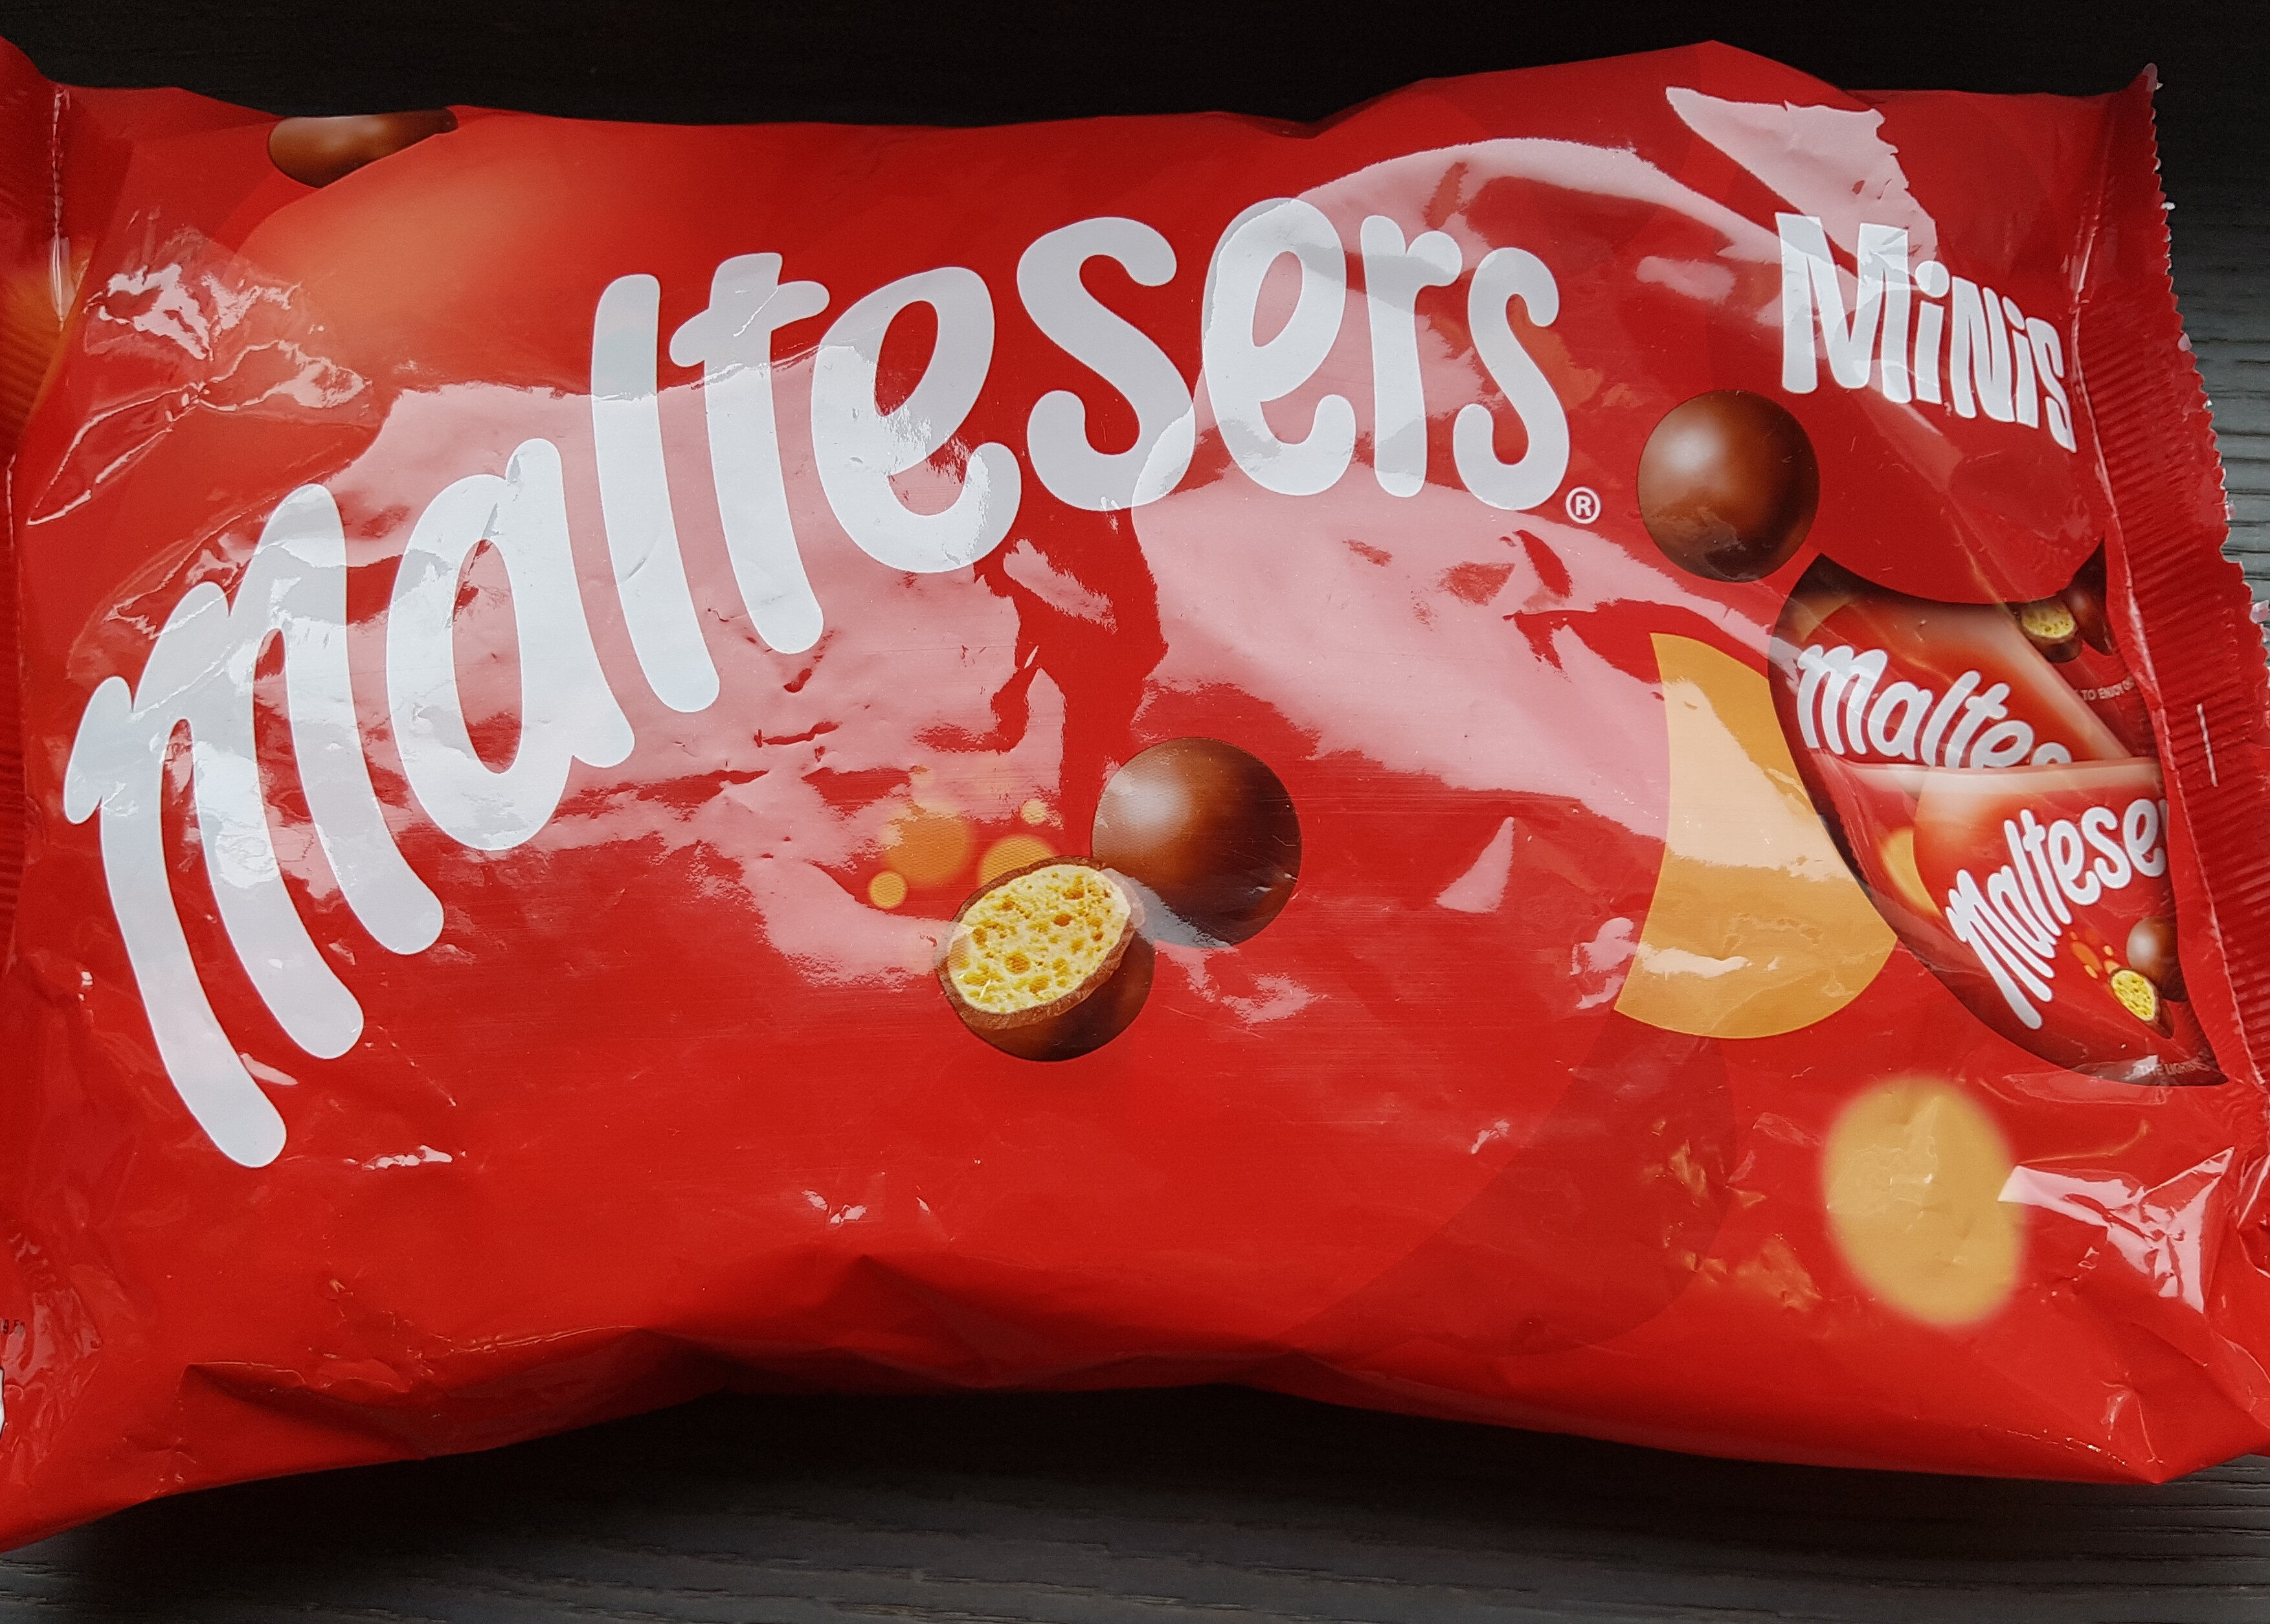 Maltesers minis - Product - es